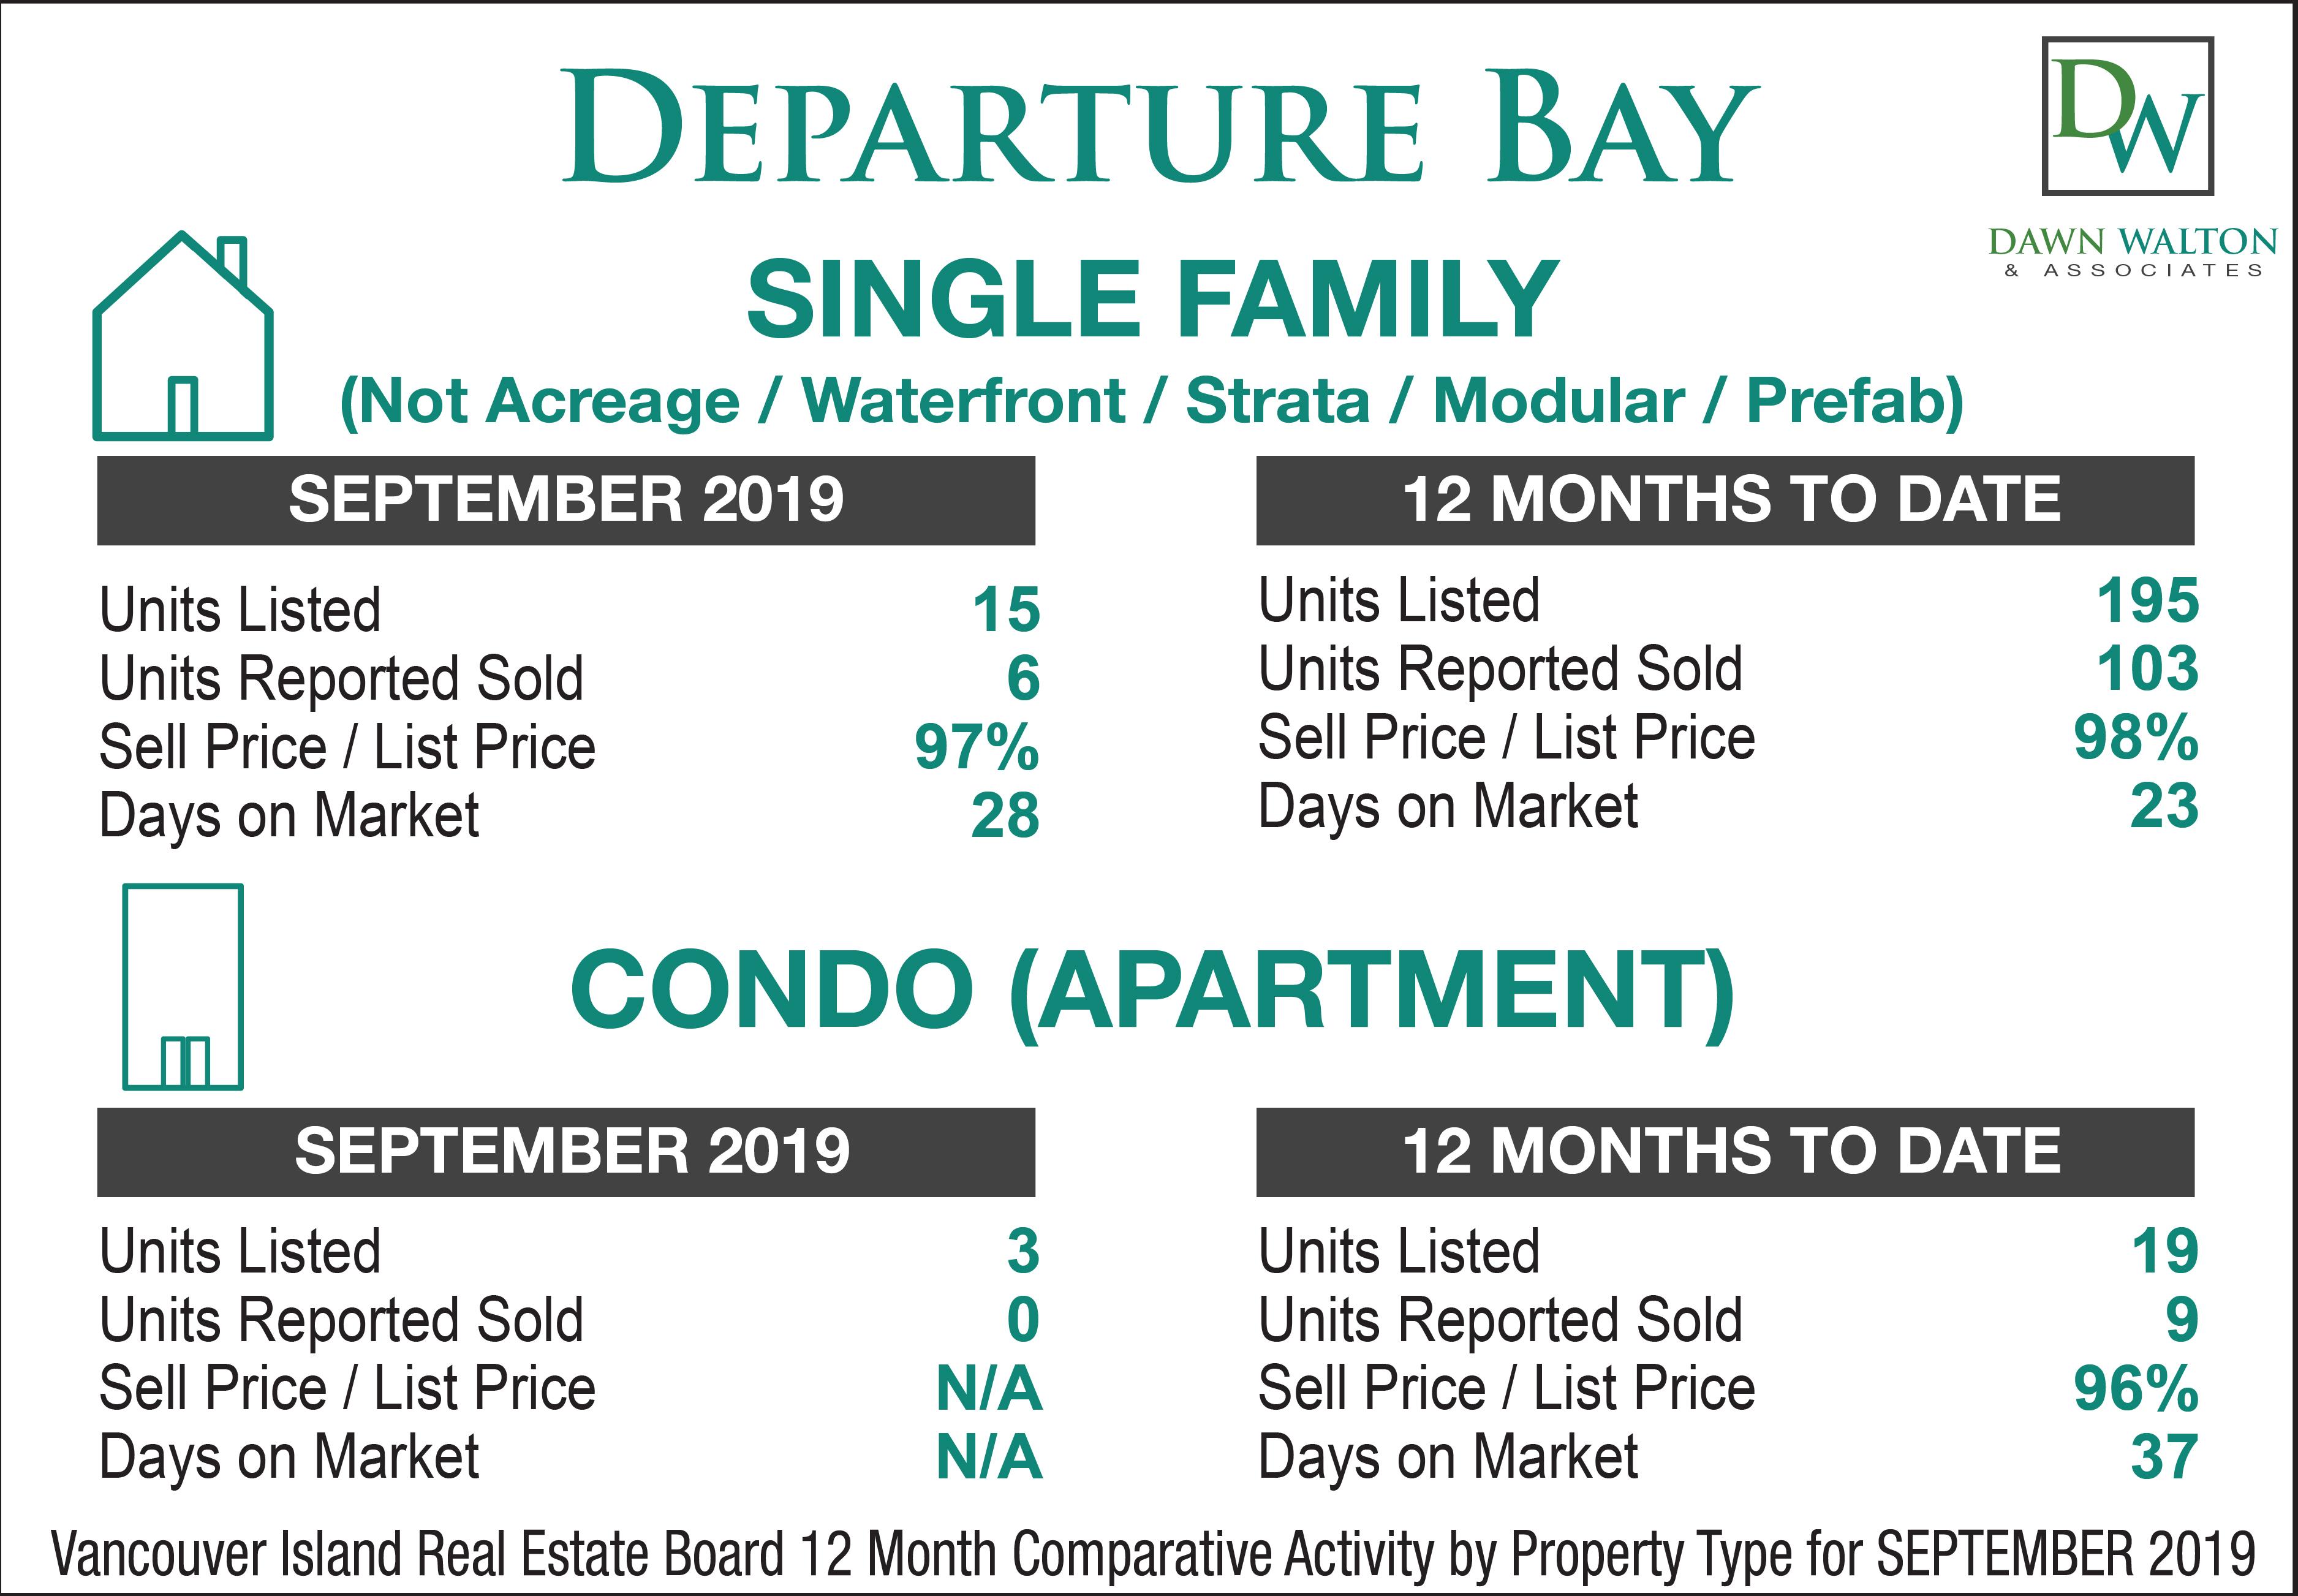 Departure Bay Real Estate Market Stats September 2019 - Nanaimo Realtor Dawn Walton